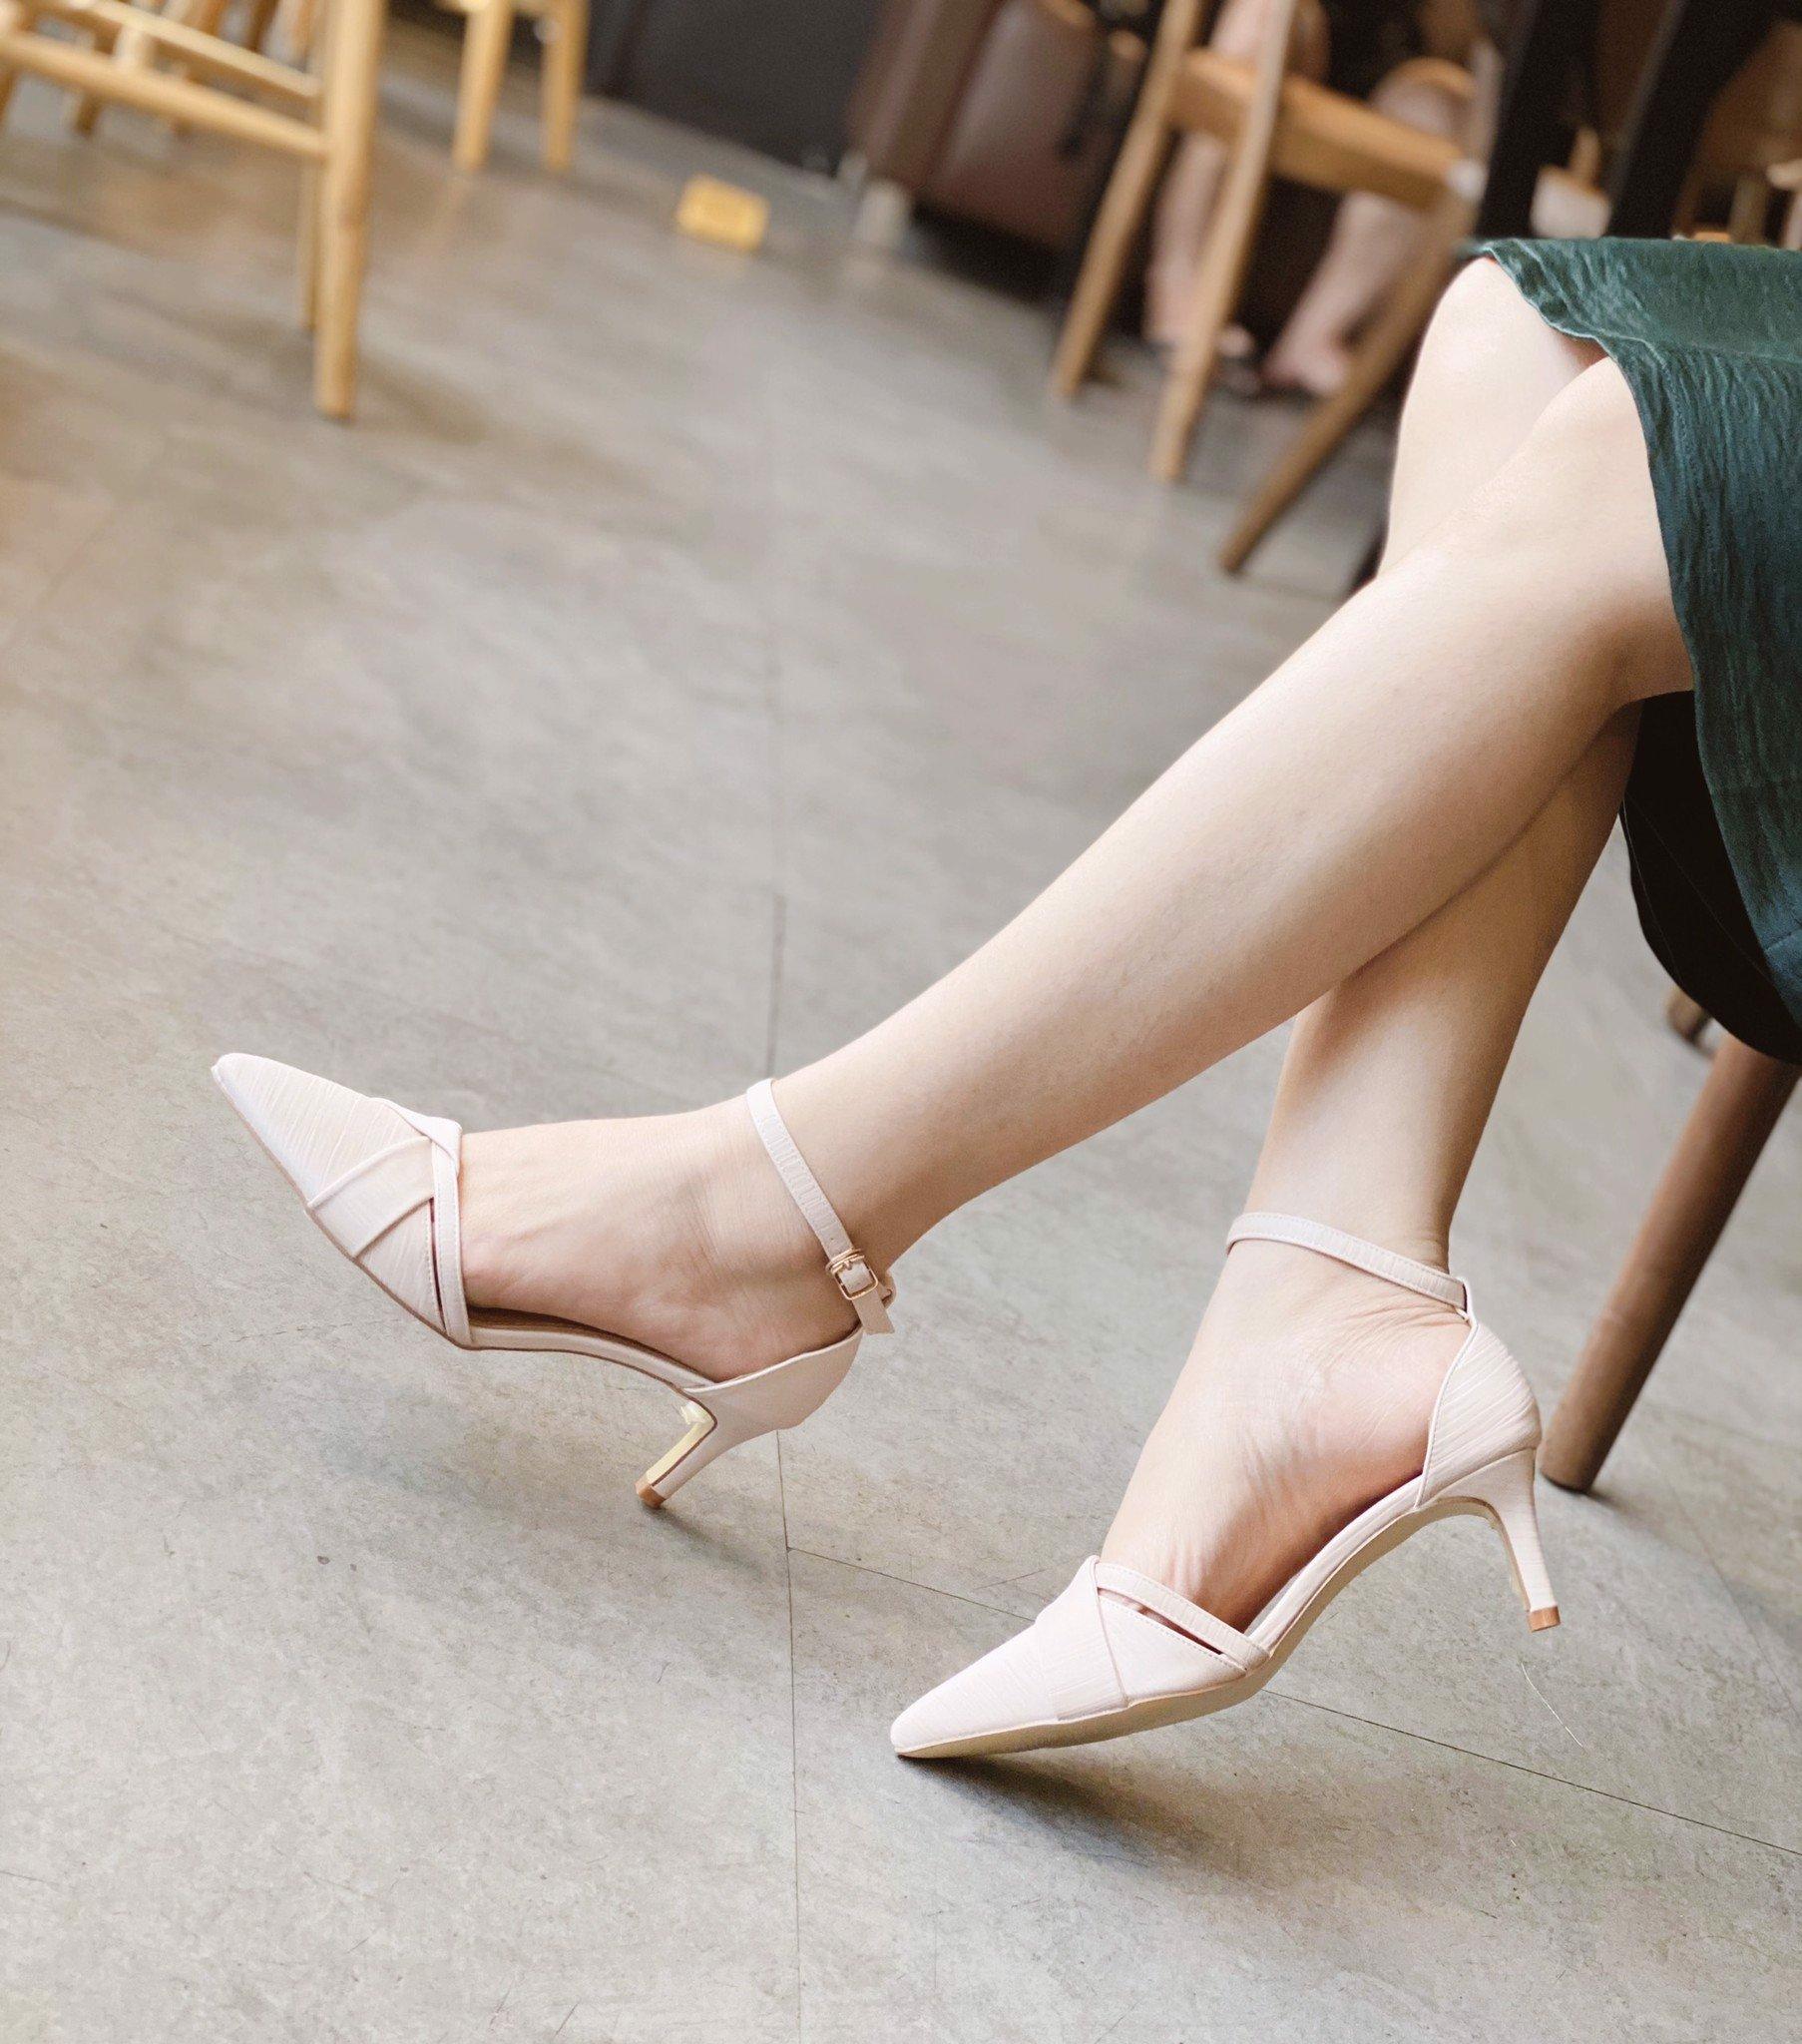 Sandal Bít Xoắn Dây Viền